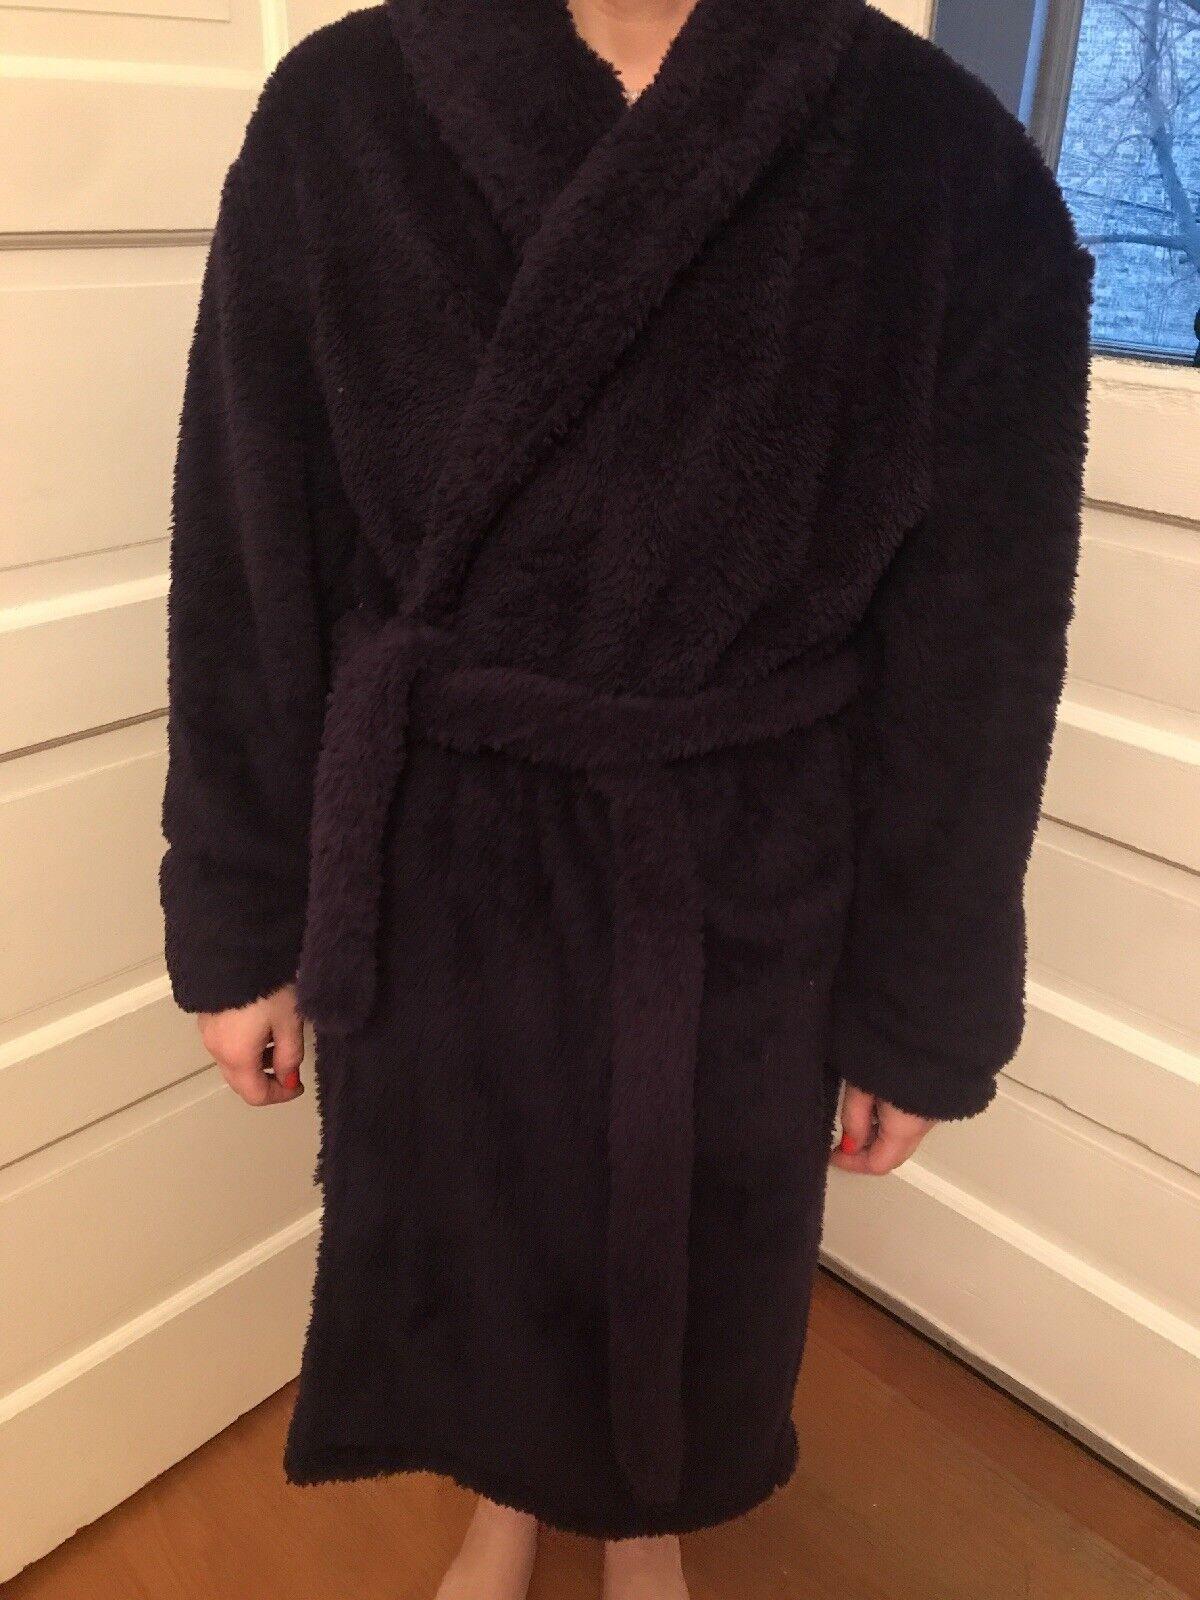 Alexander Del Rossa Womens Fleece Robe, Plush Microfiber Bathrobe, Small Medium